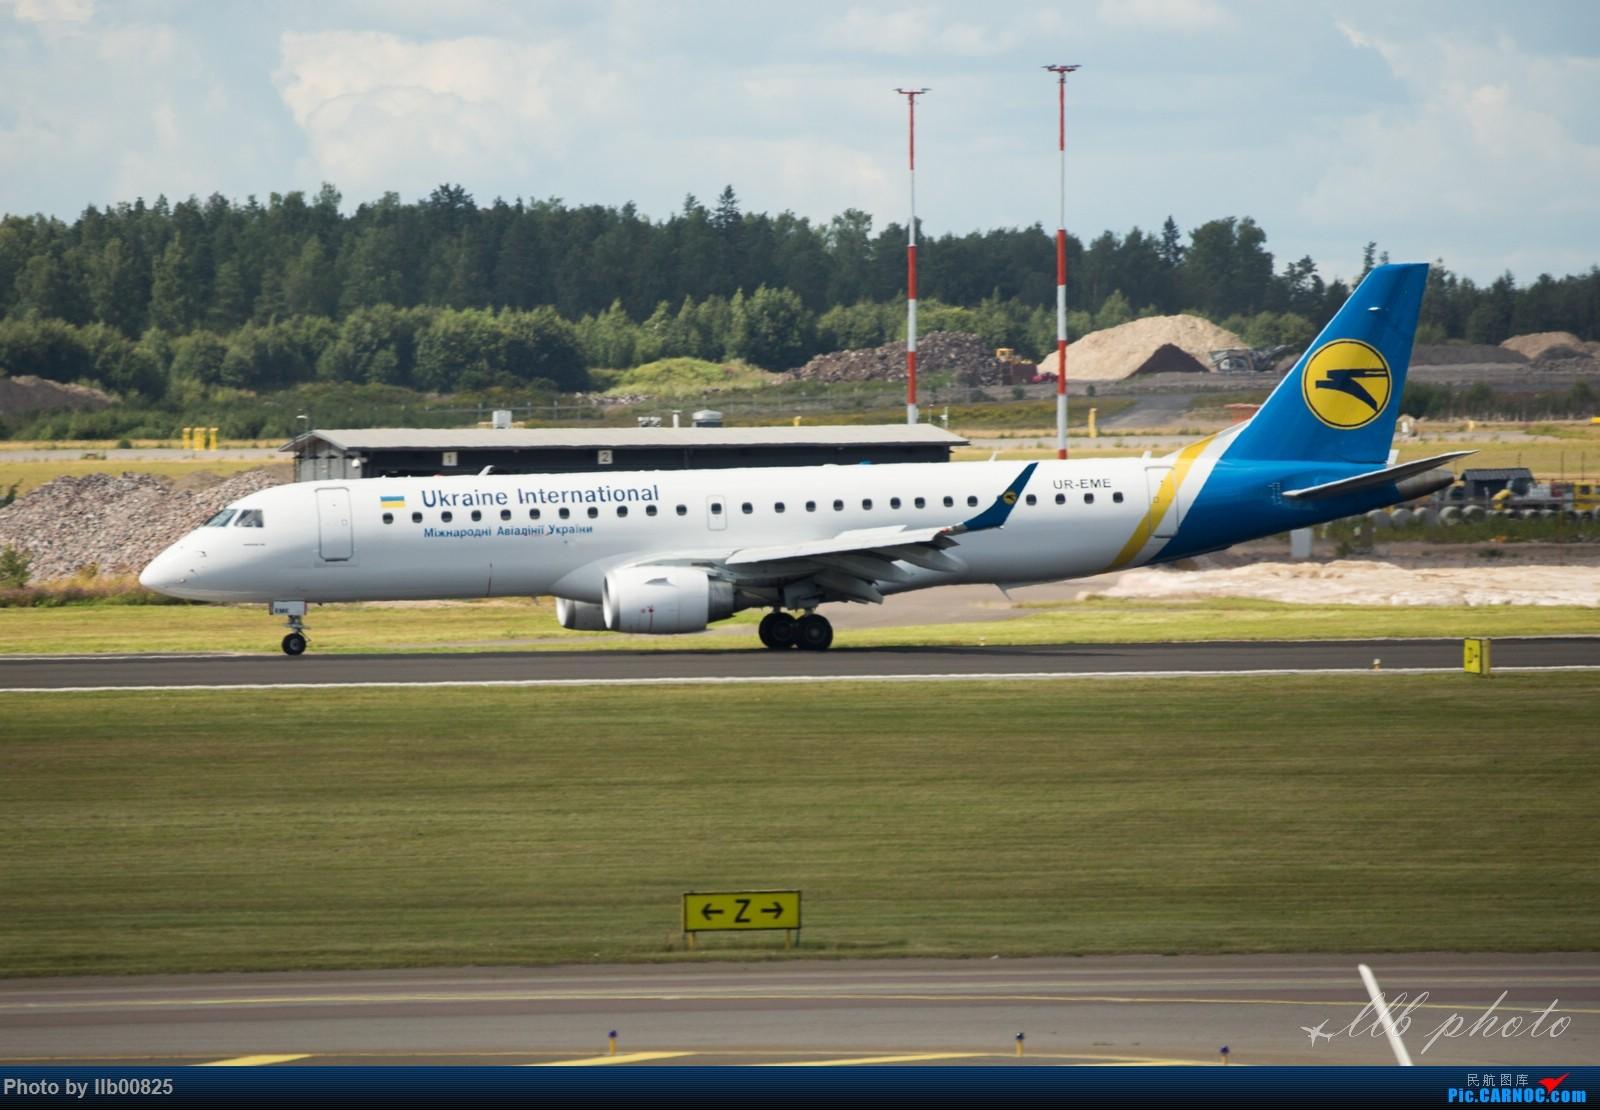 Re:[原创]赫尔辛基-布鲁塞尔一些杂图 EMBRAER E-190 UR-EME 芬兰赫尔辛基机场